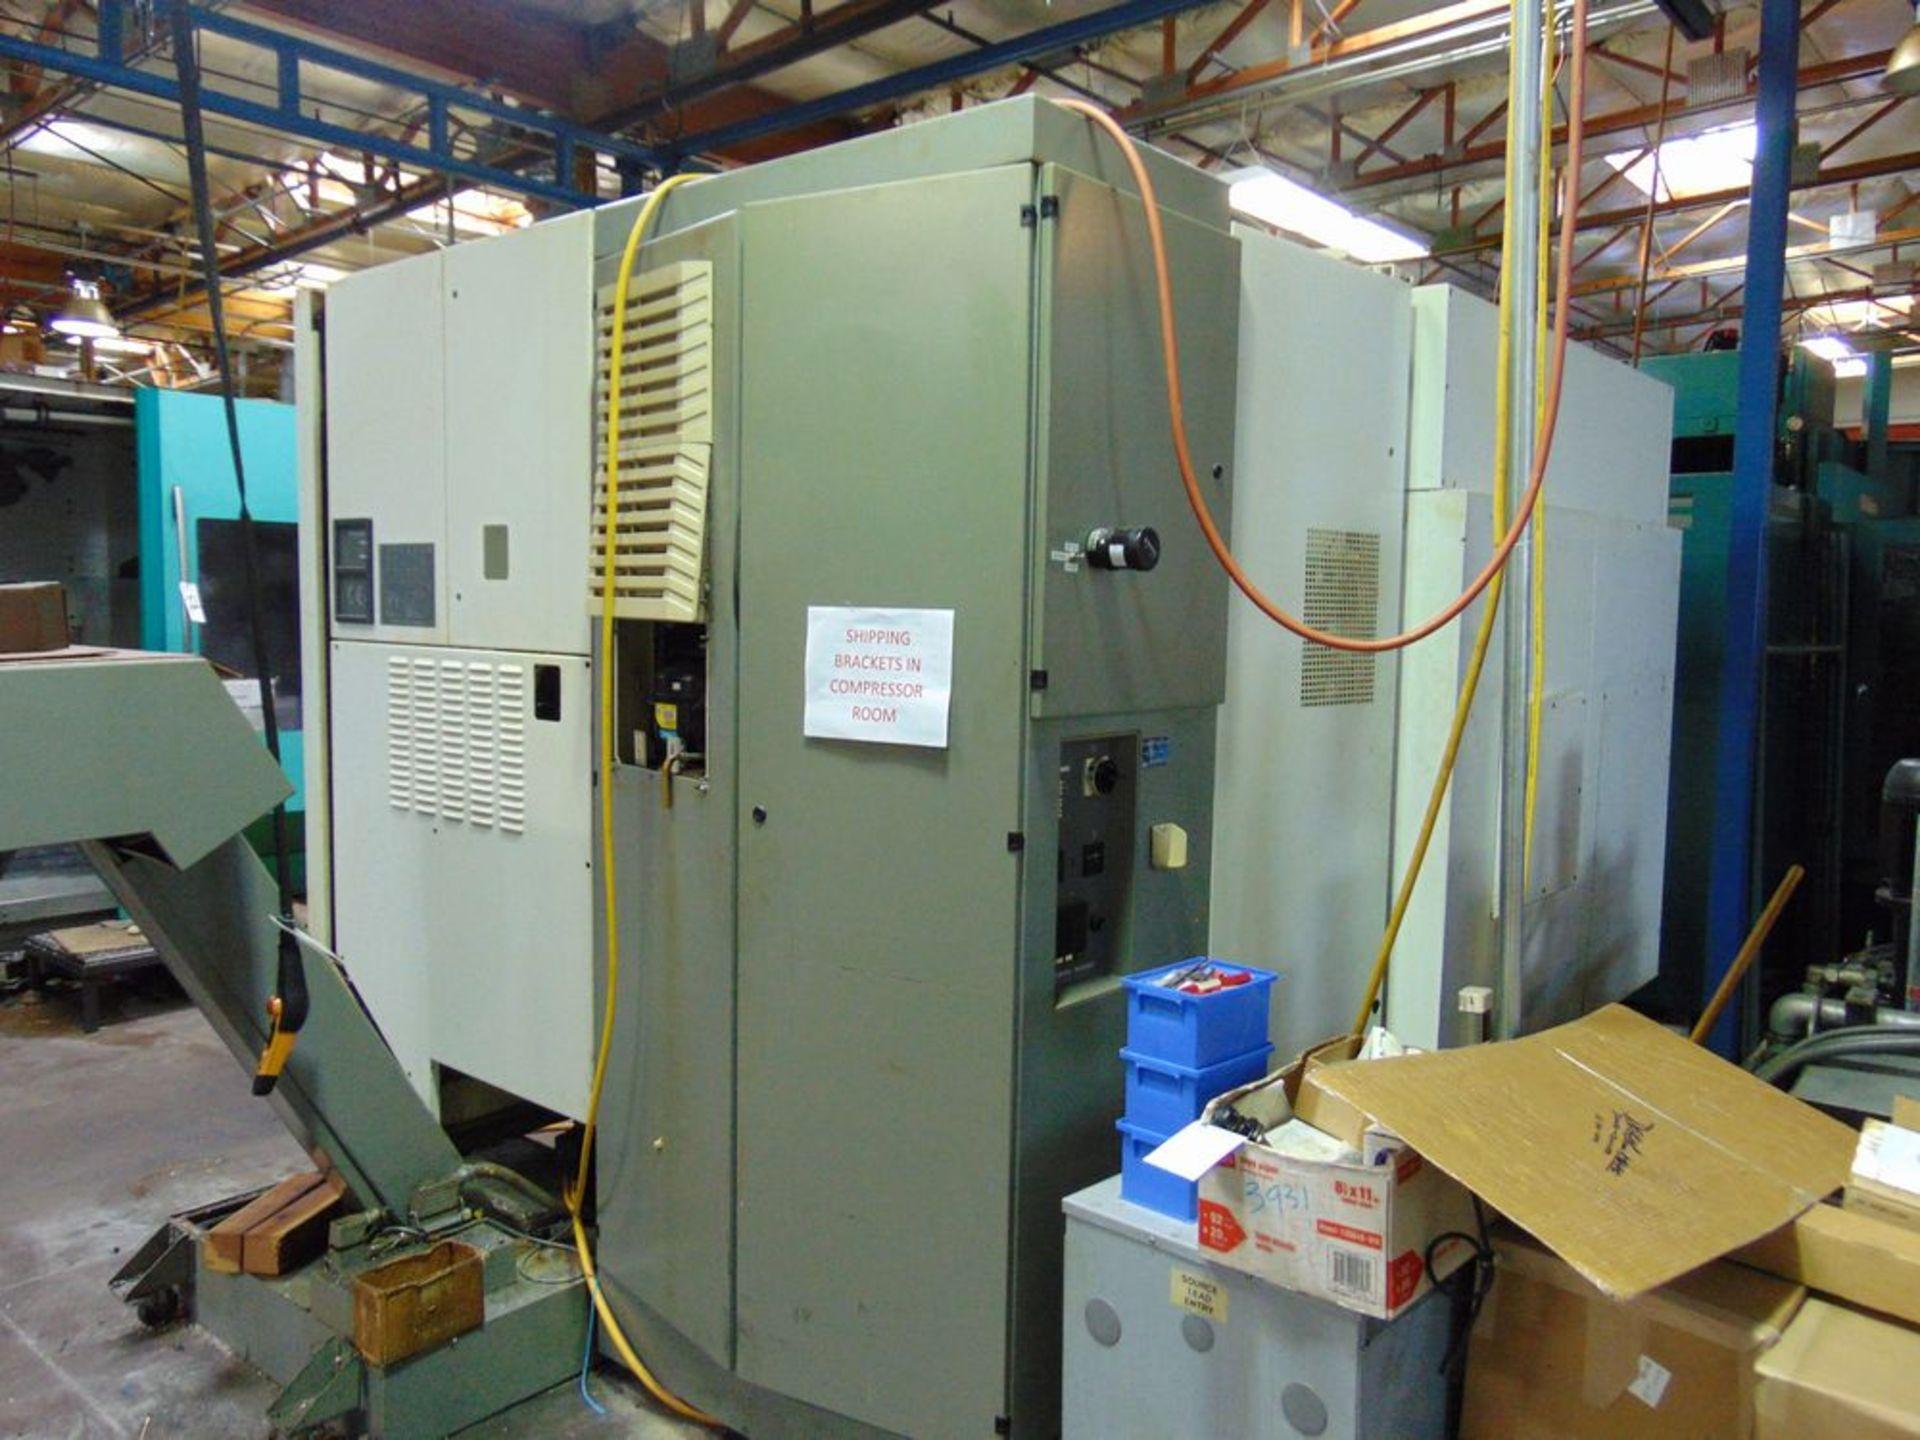 Lot 21 - (2001) Deckel Maho mod. DMU80P, Hi-Dym, 5-Axis CNC Horizontal Machine Center w/ Knuckle Joint